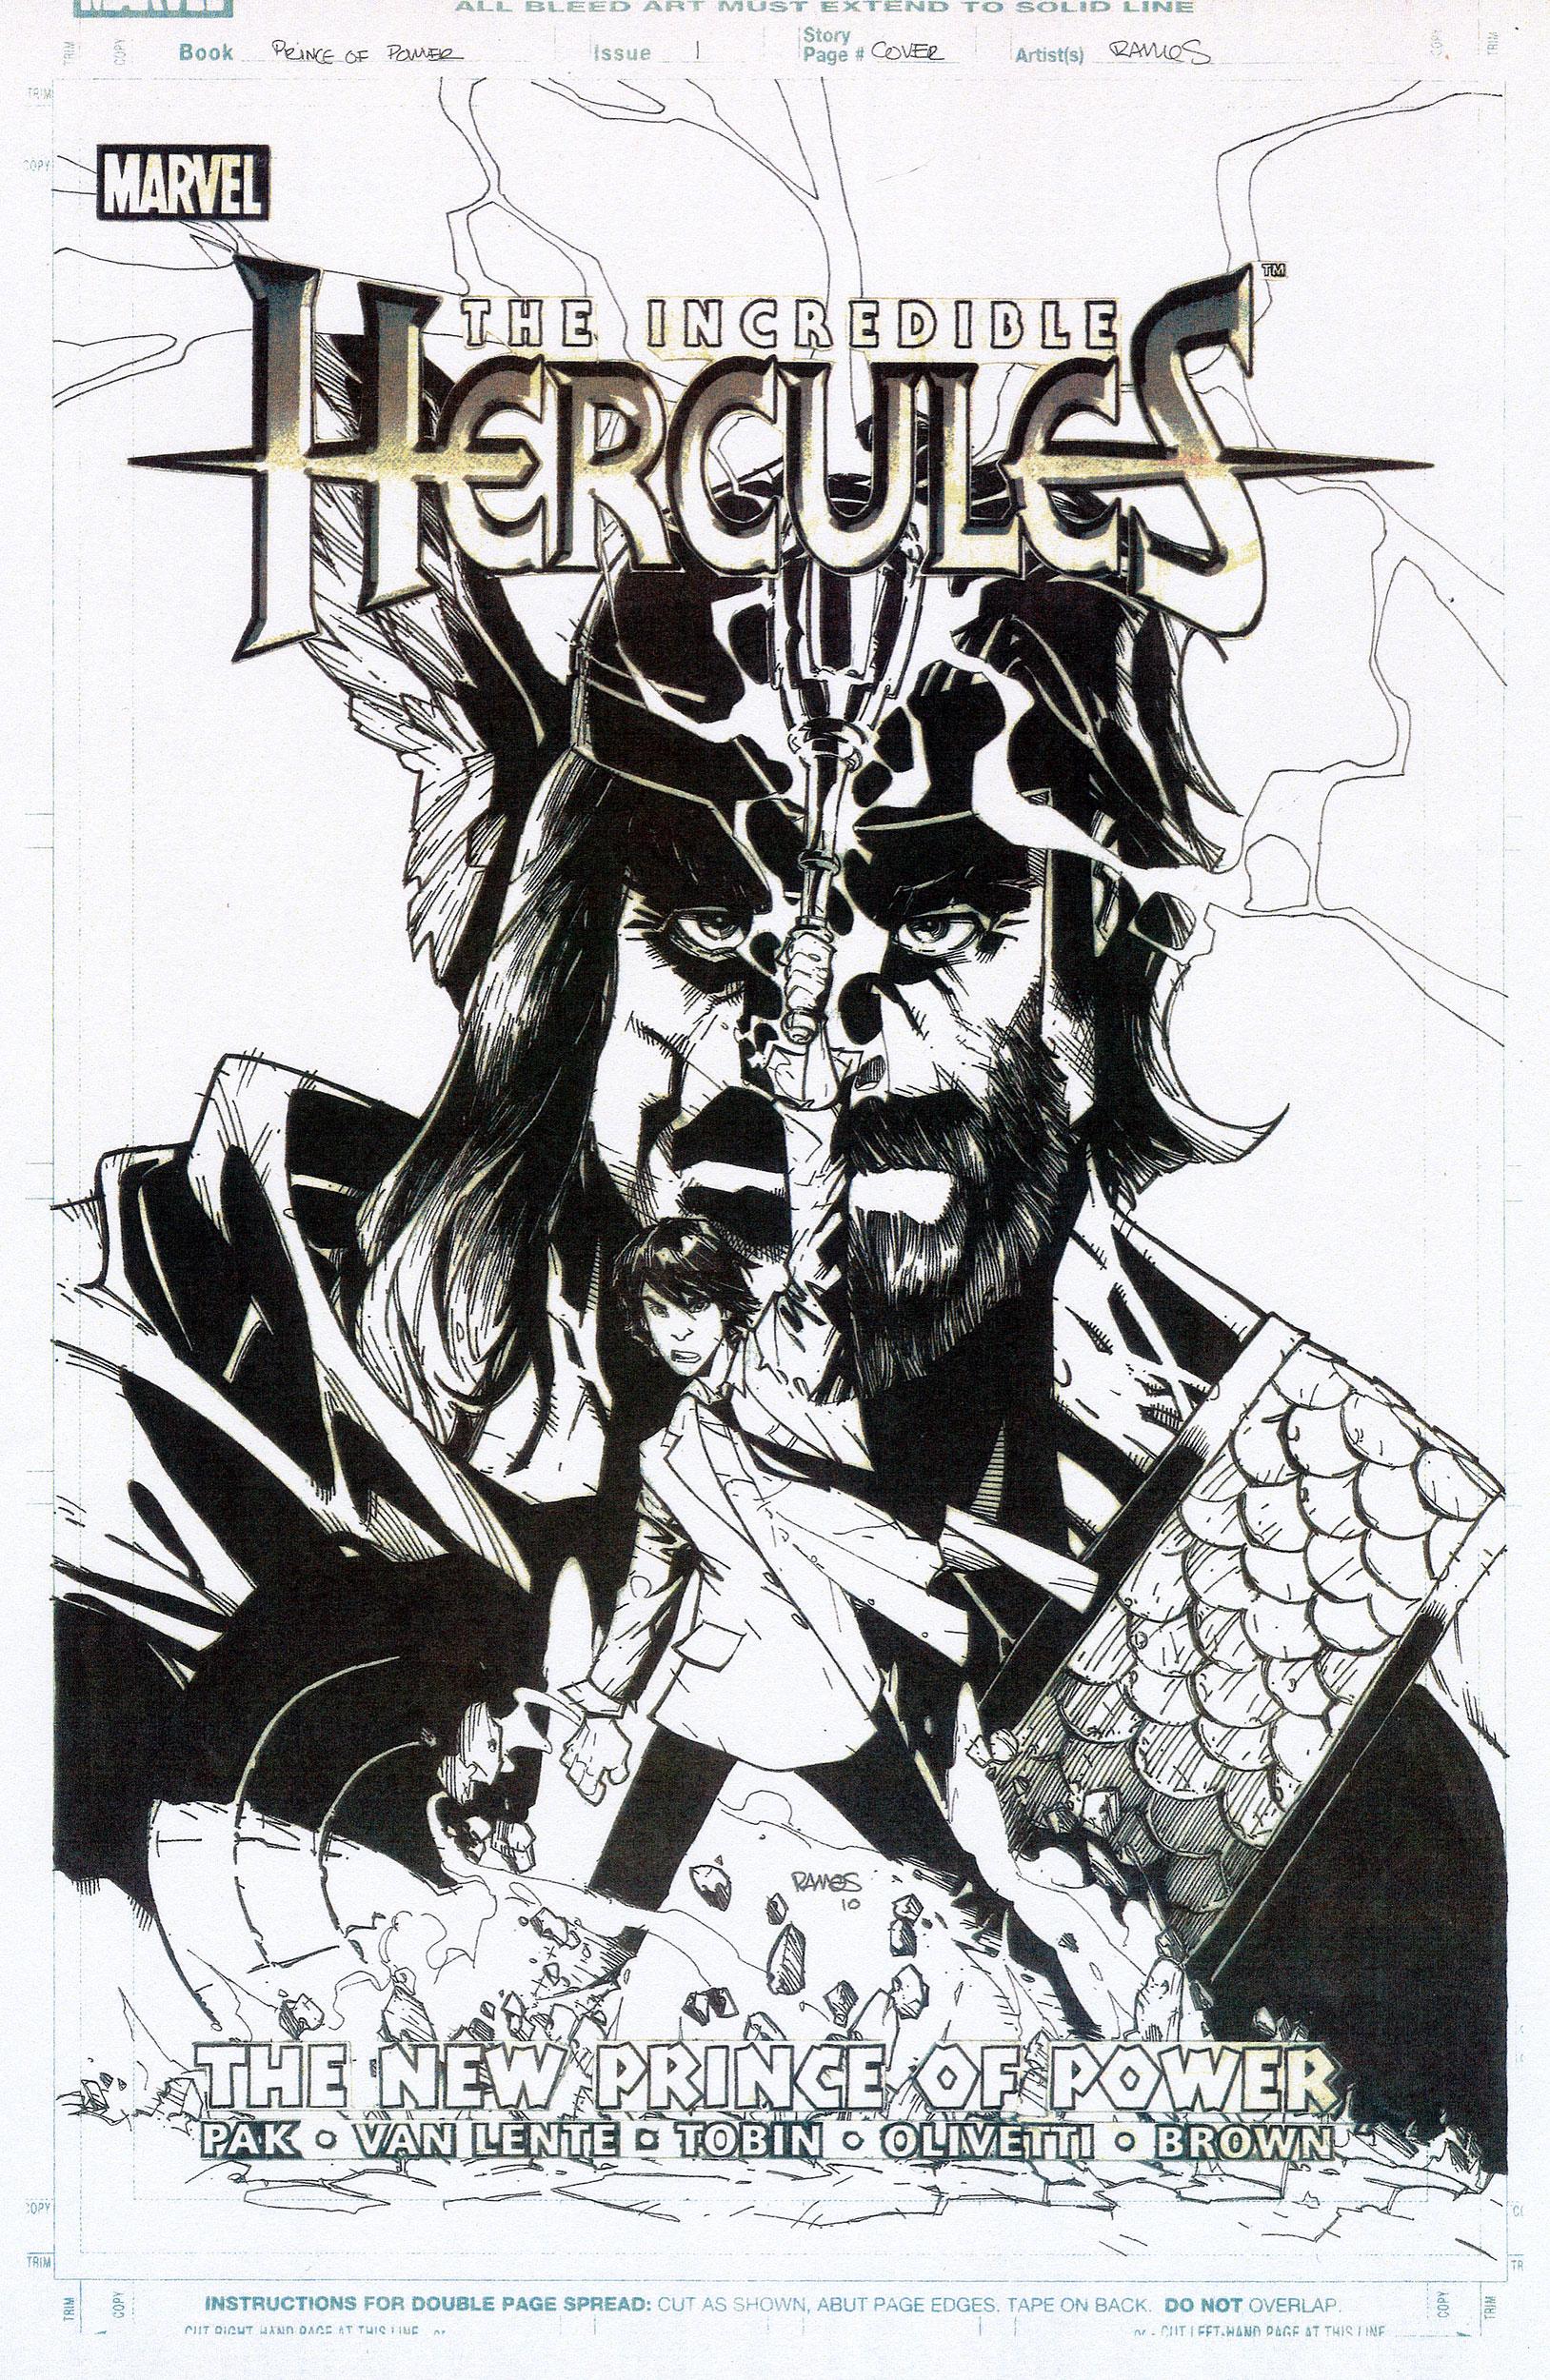 HUMBERTO RAMOS 2010 PRINCE + POWER #1 COVER Comic Art